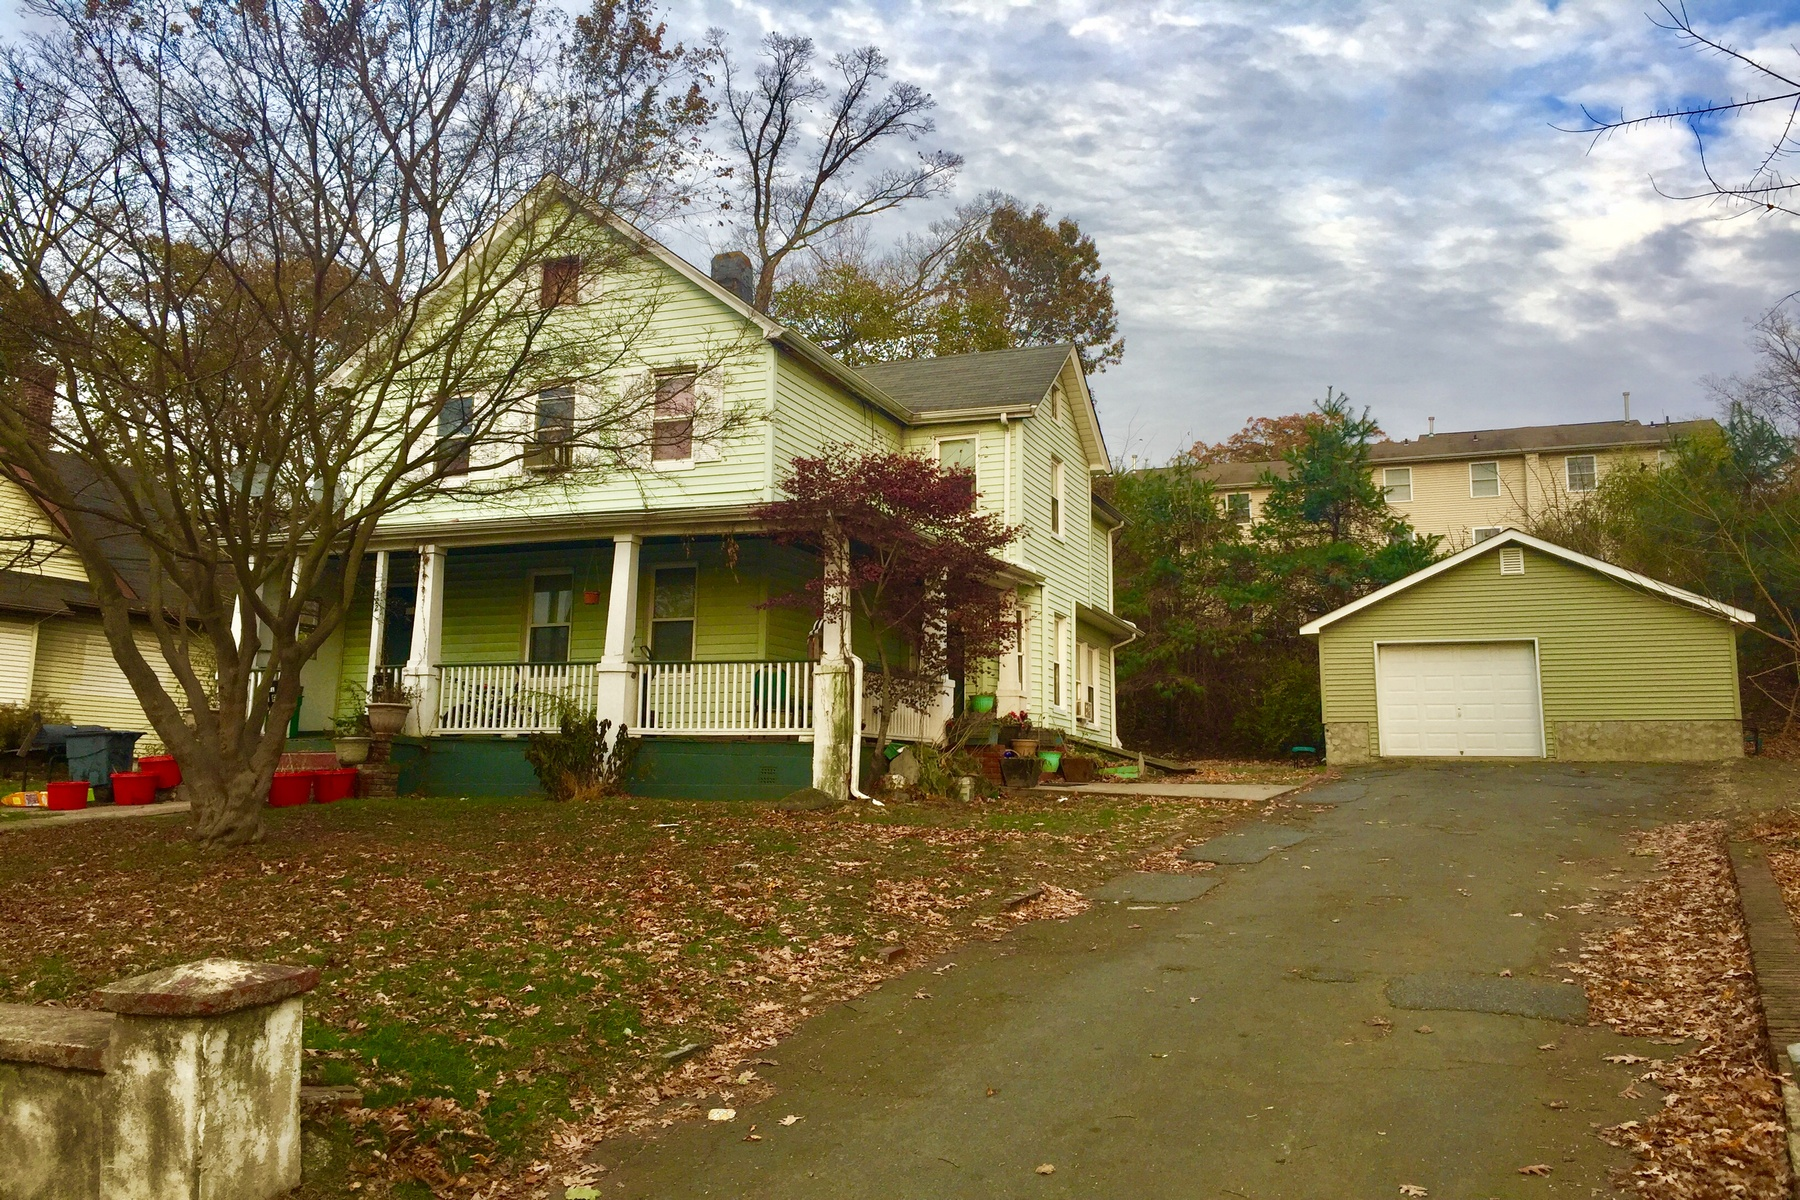 Multi-Family Homes für Verkauf beim Fantastic Two Family Home 122 Lake St, Spring Valley, New York 10977 Vereinigte Staaten